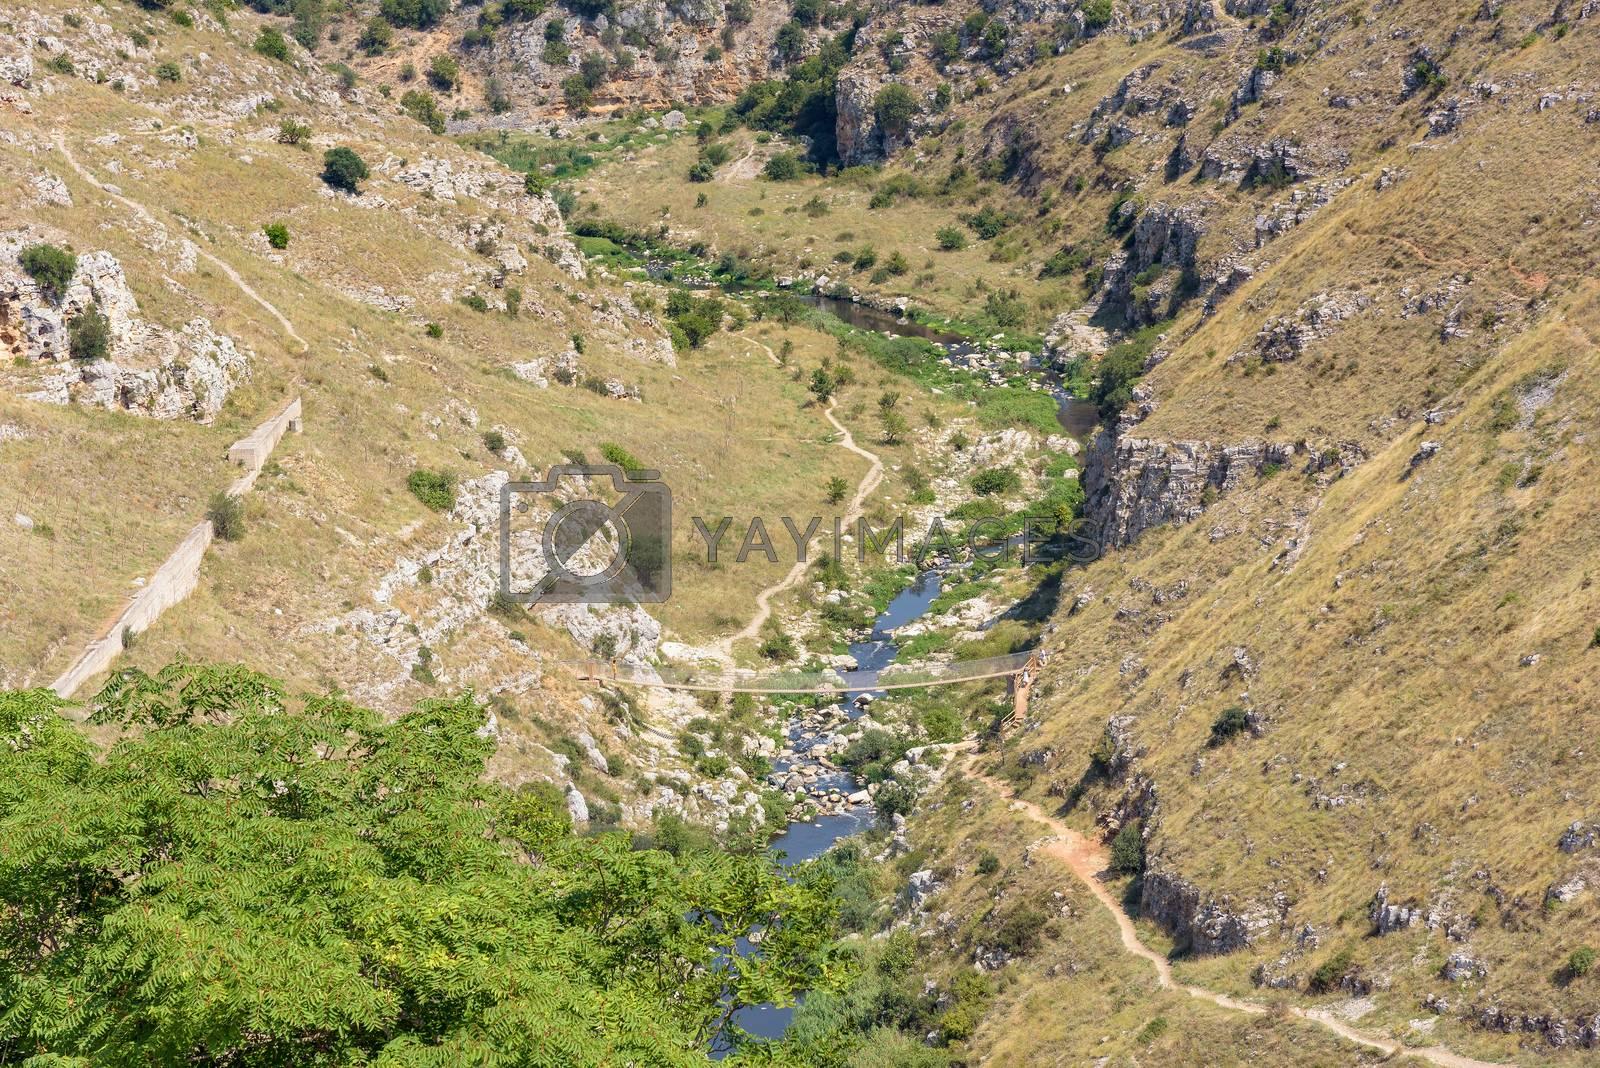 Gorge of the Gravina di Matera river, Basilicata, Italy